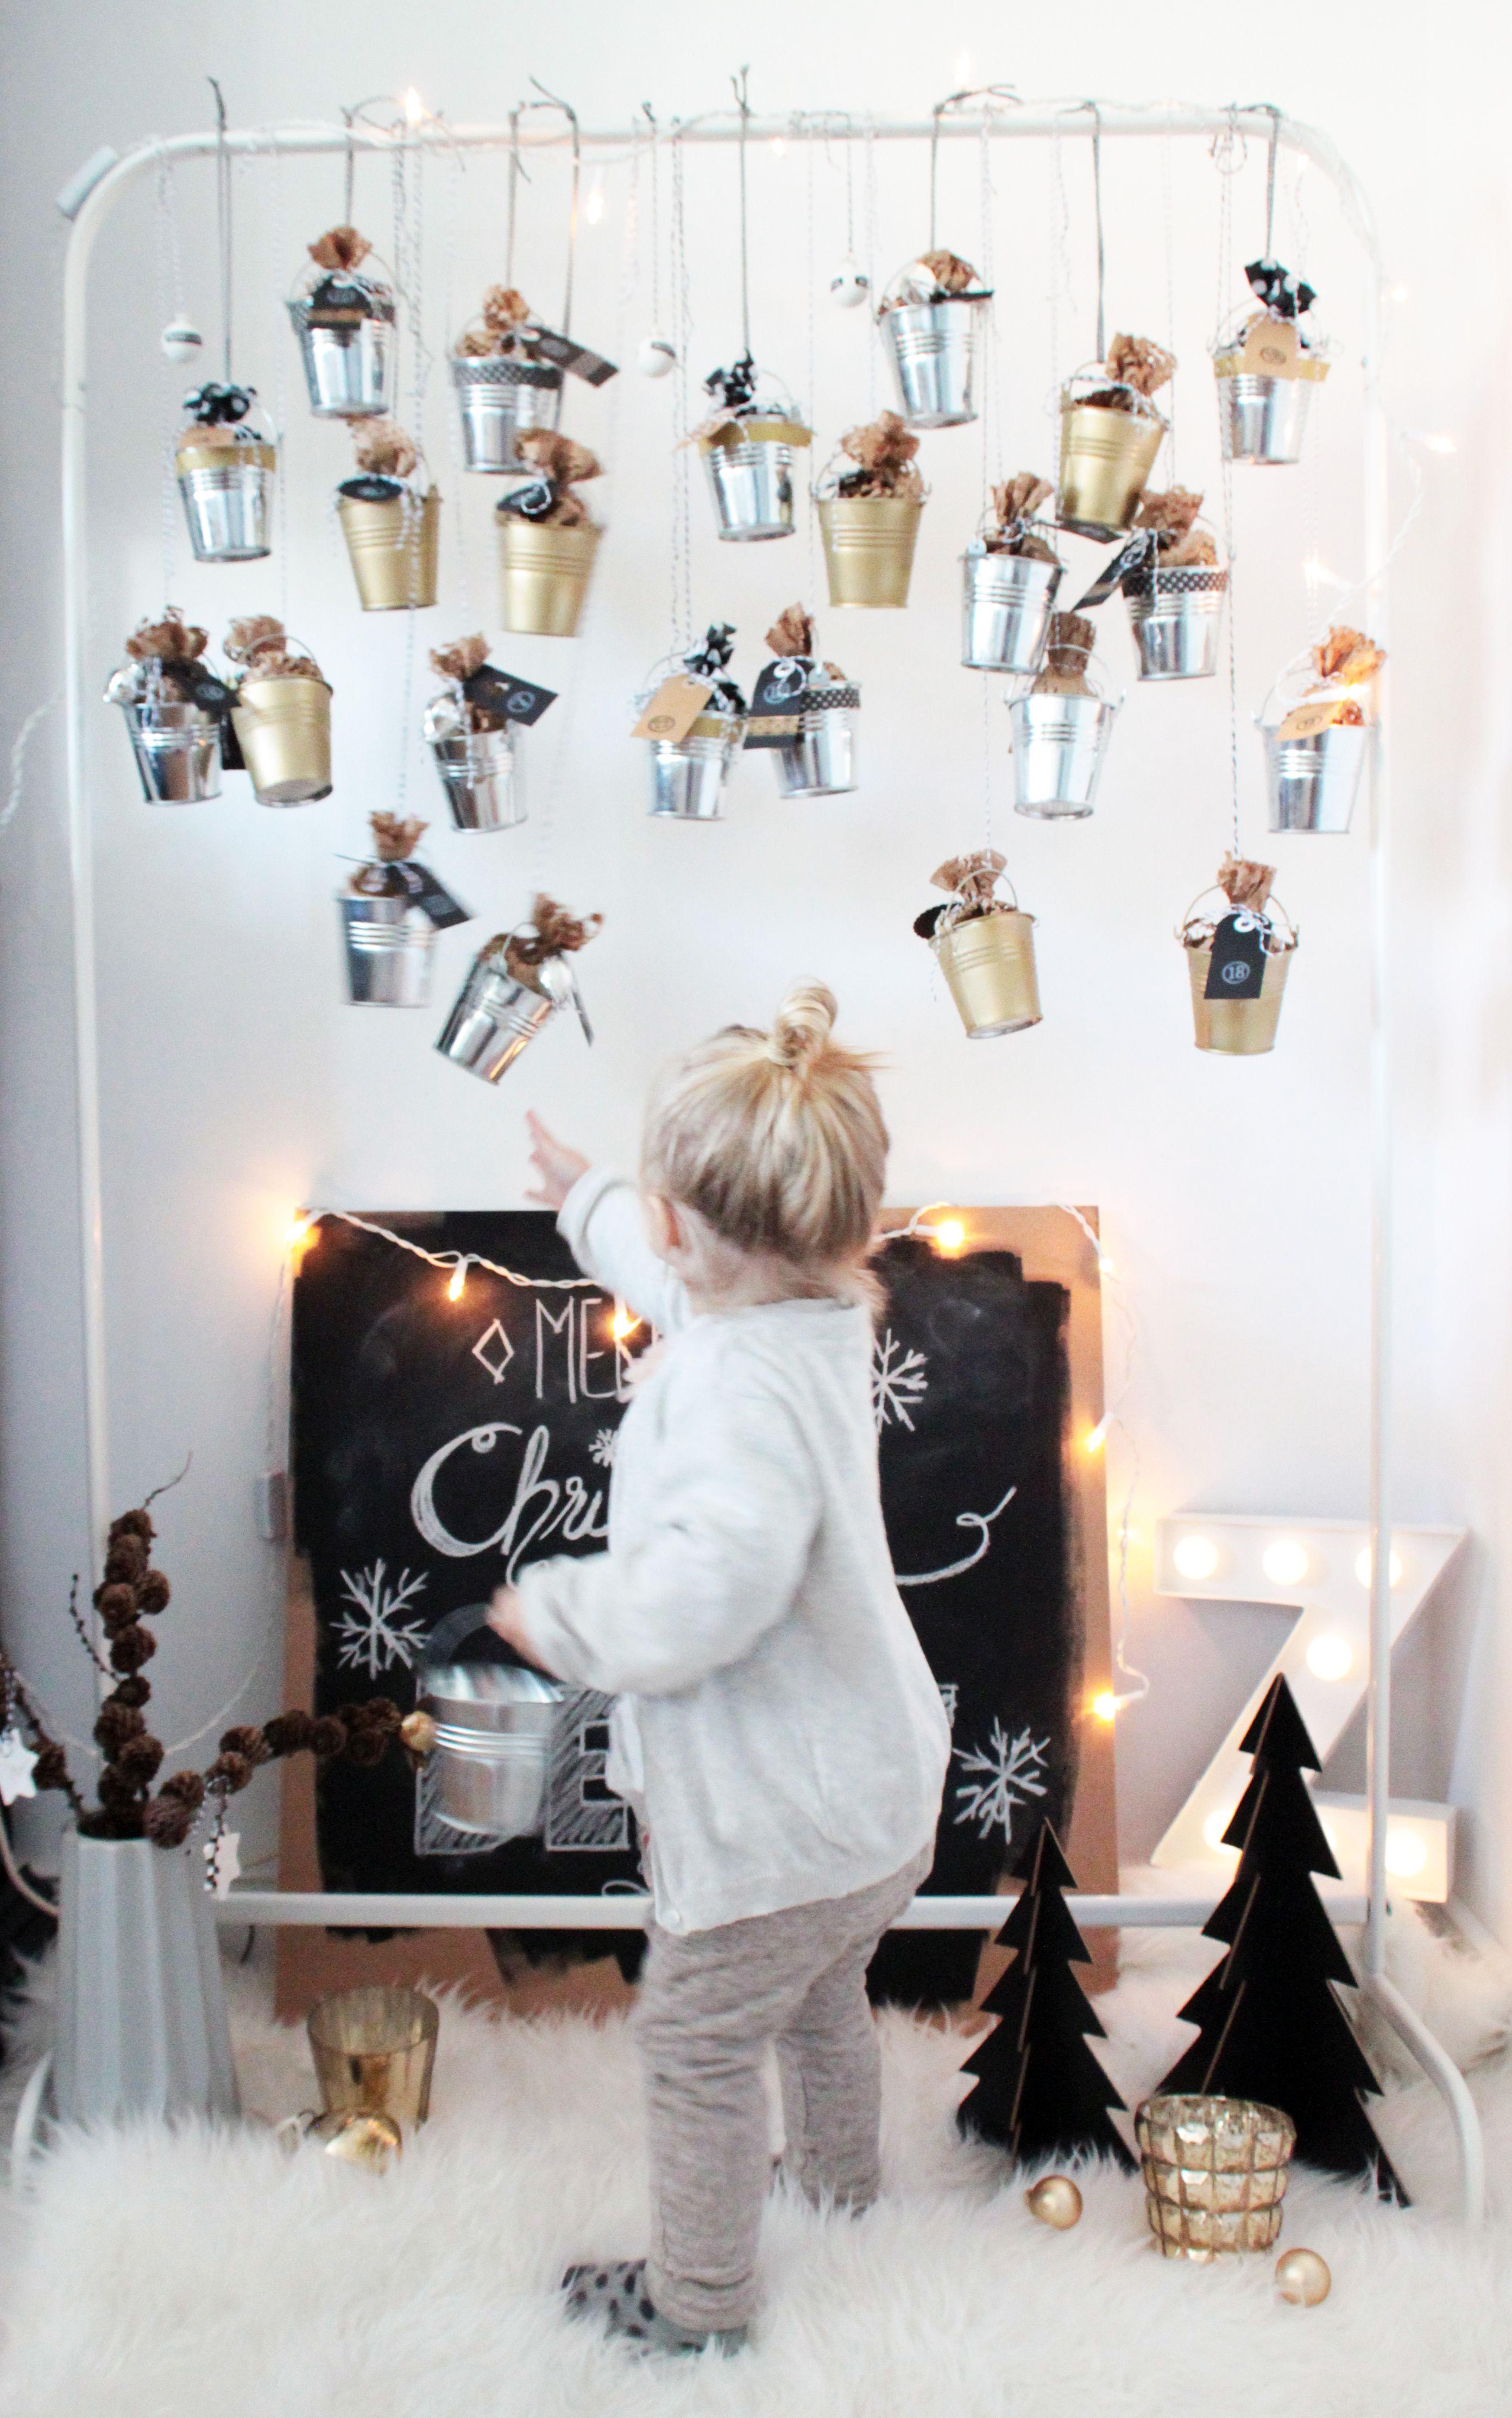 Ein Ruck-Zuck DIY #Adventskalender aus kleinen Blecheimerchen #diy #kidsadventcalendar #adventskranzideenkinder